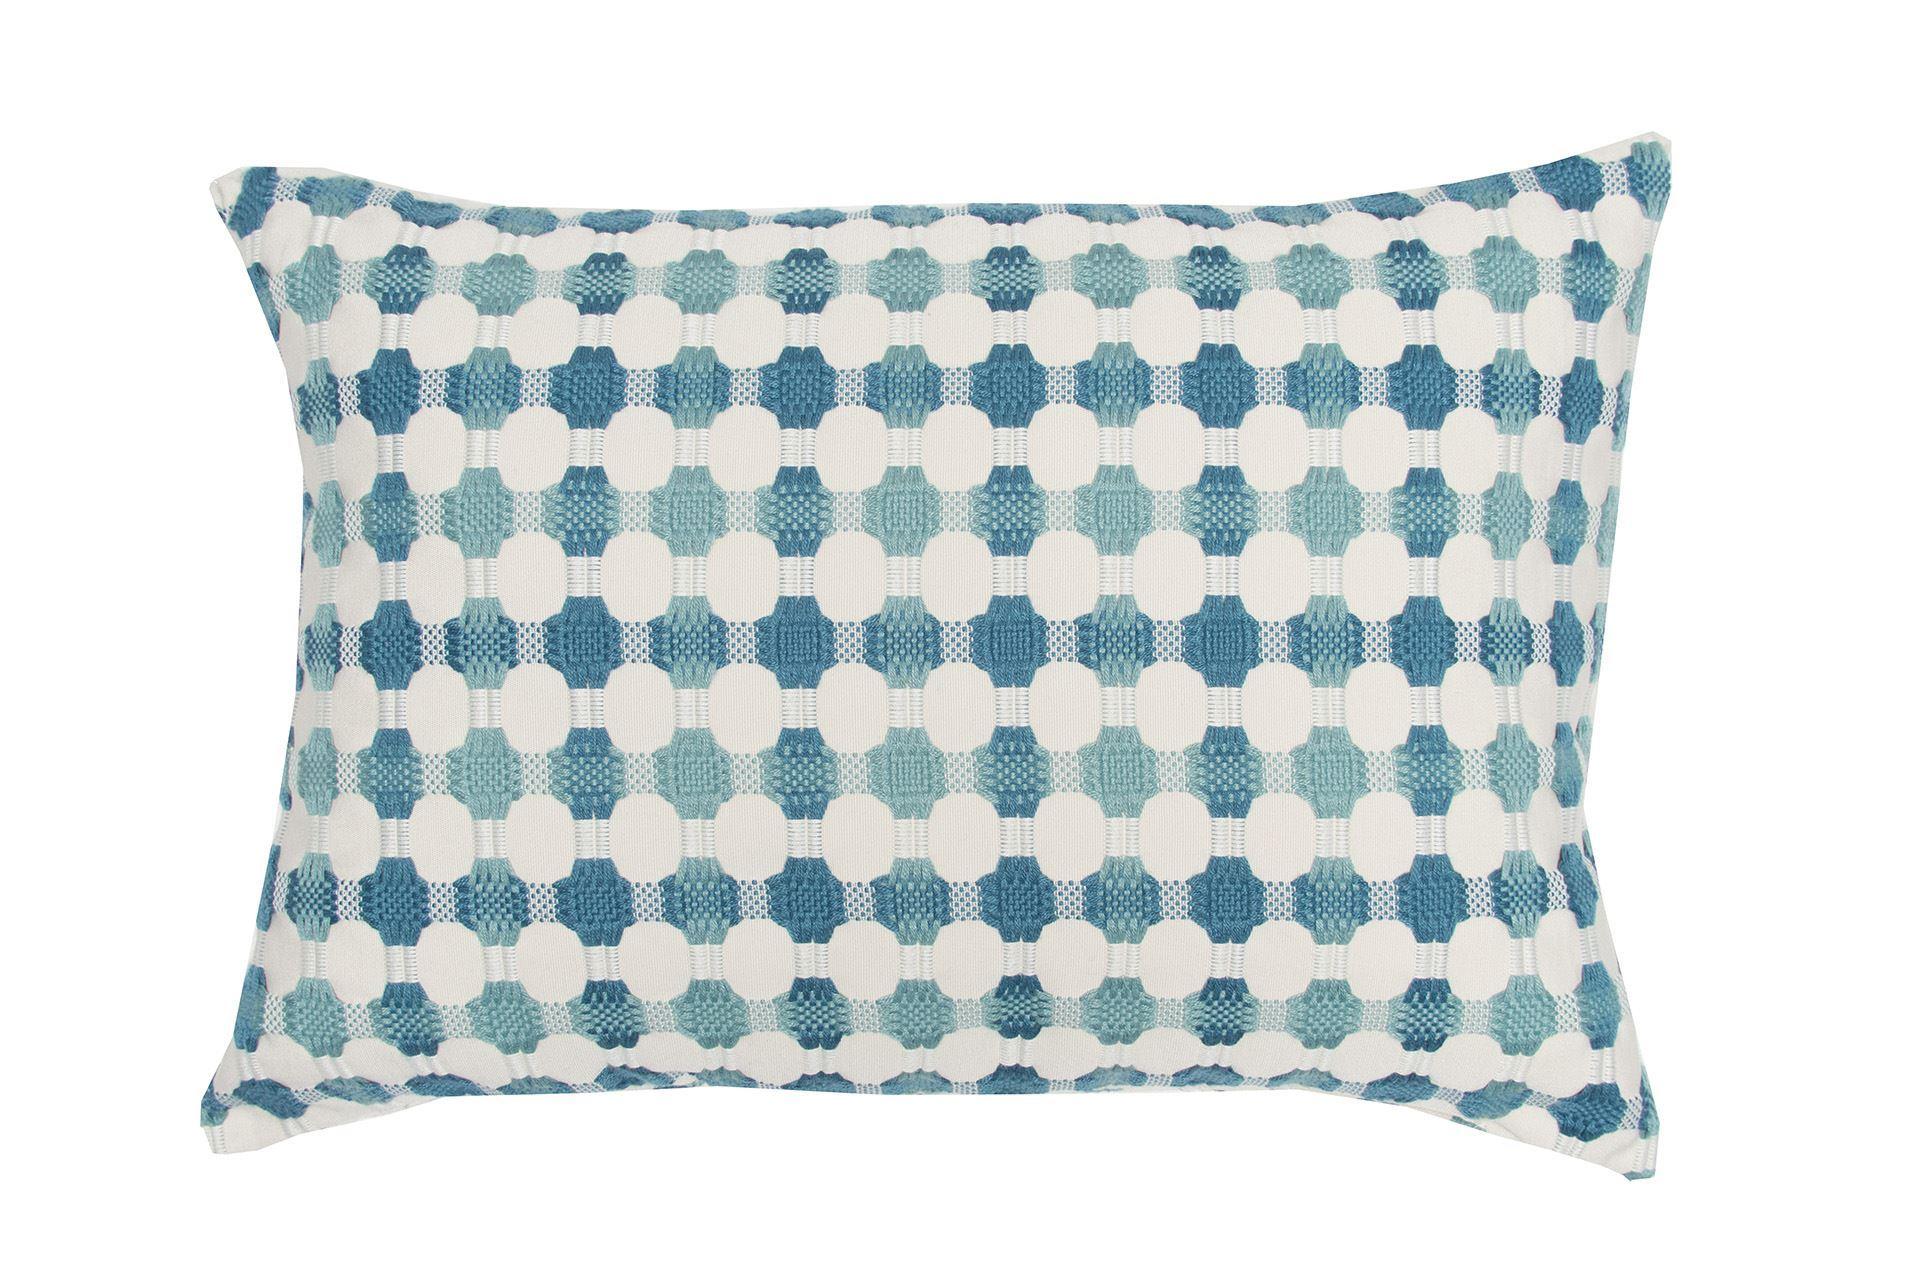 Decorative Pillows Living Spaces : Accent Pillow-Kadri Teal 14X20 - Living Spaces